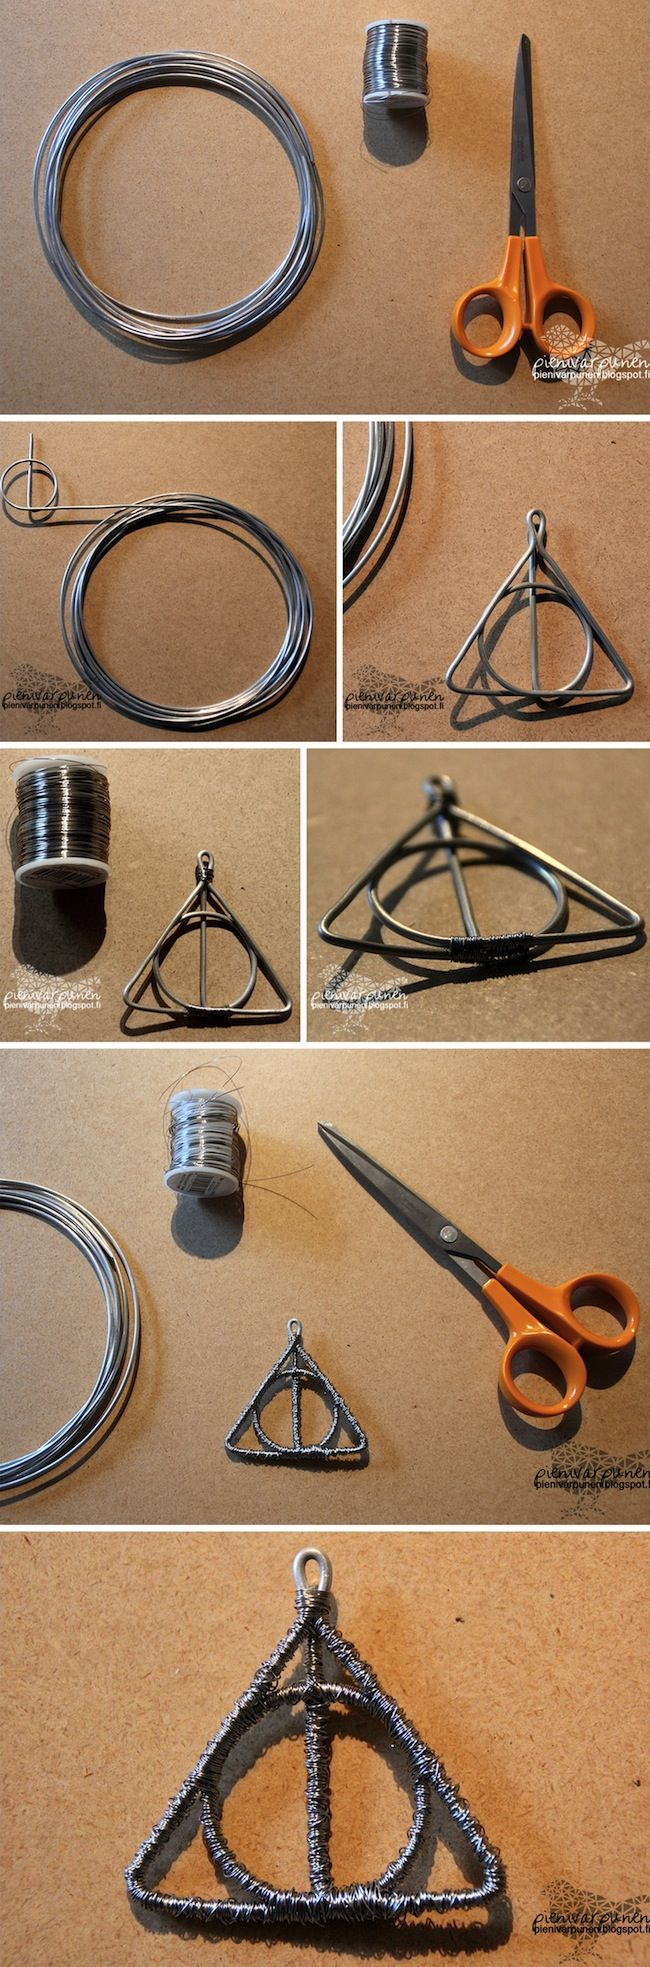 pin von candela arrojo barbieri auf harry potter | pinterest | harry